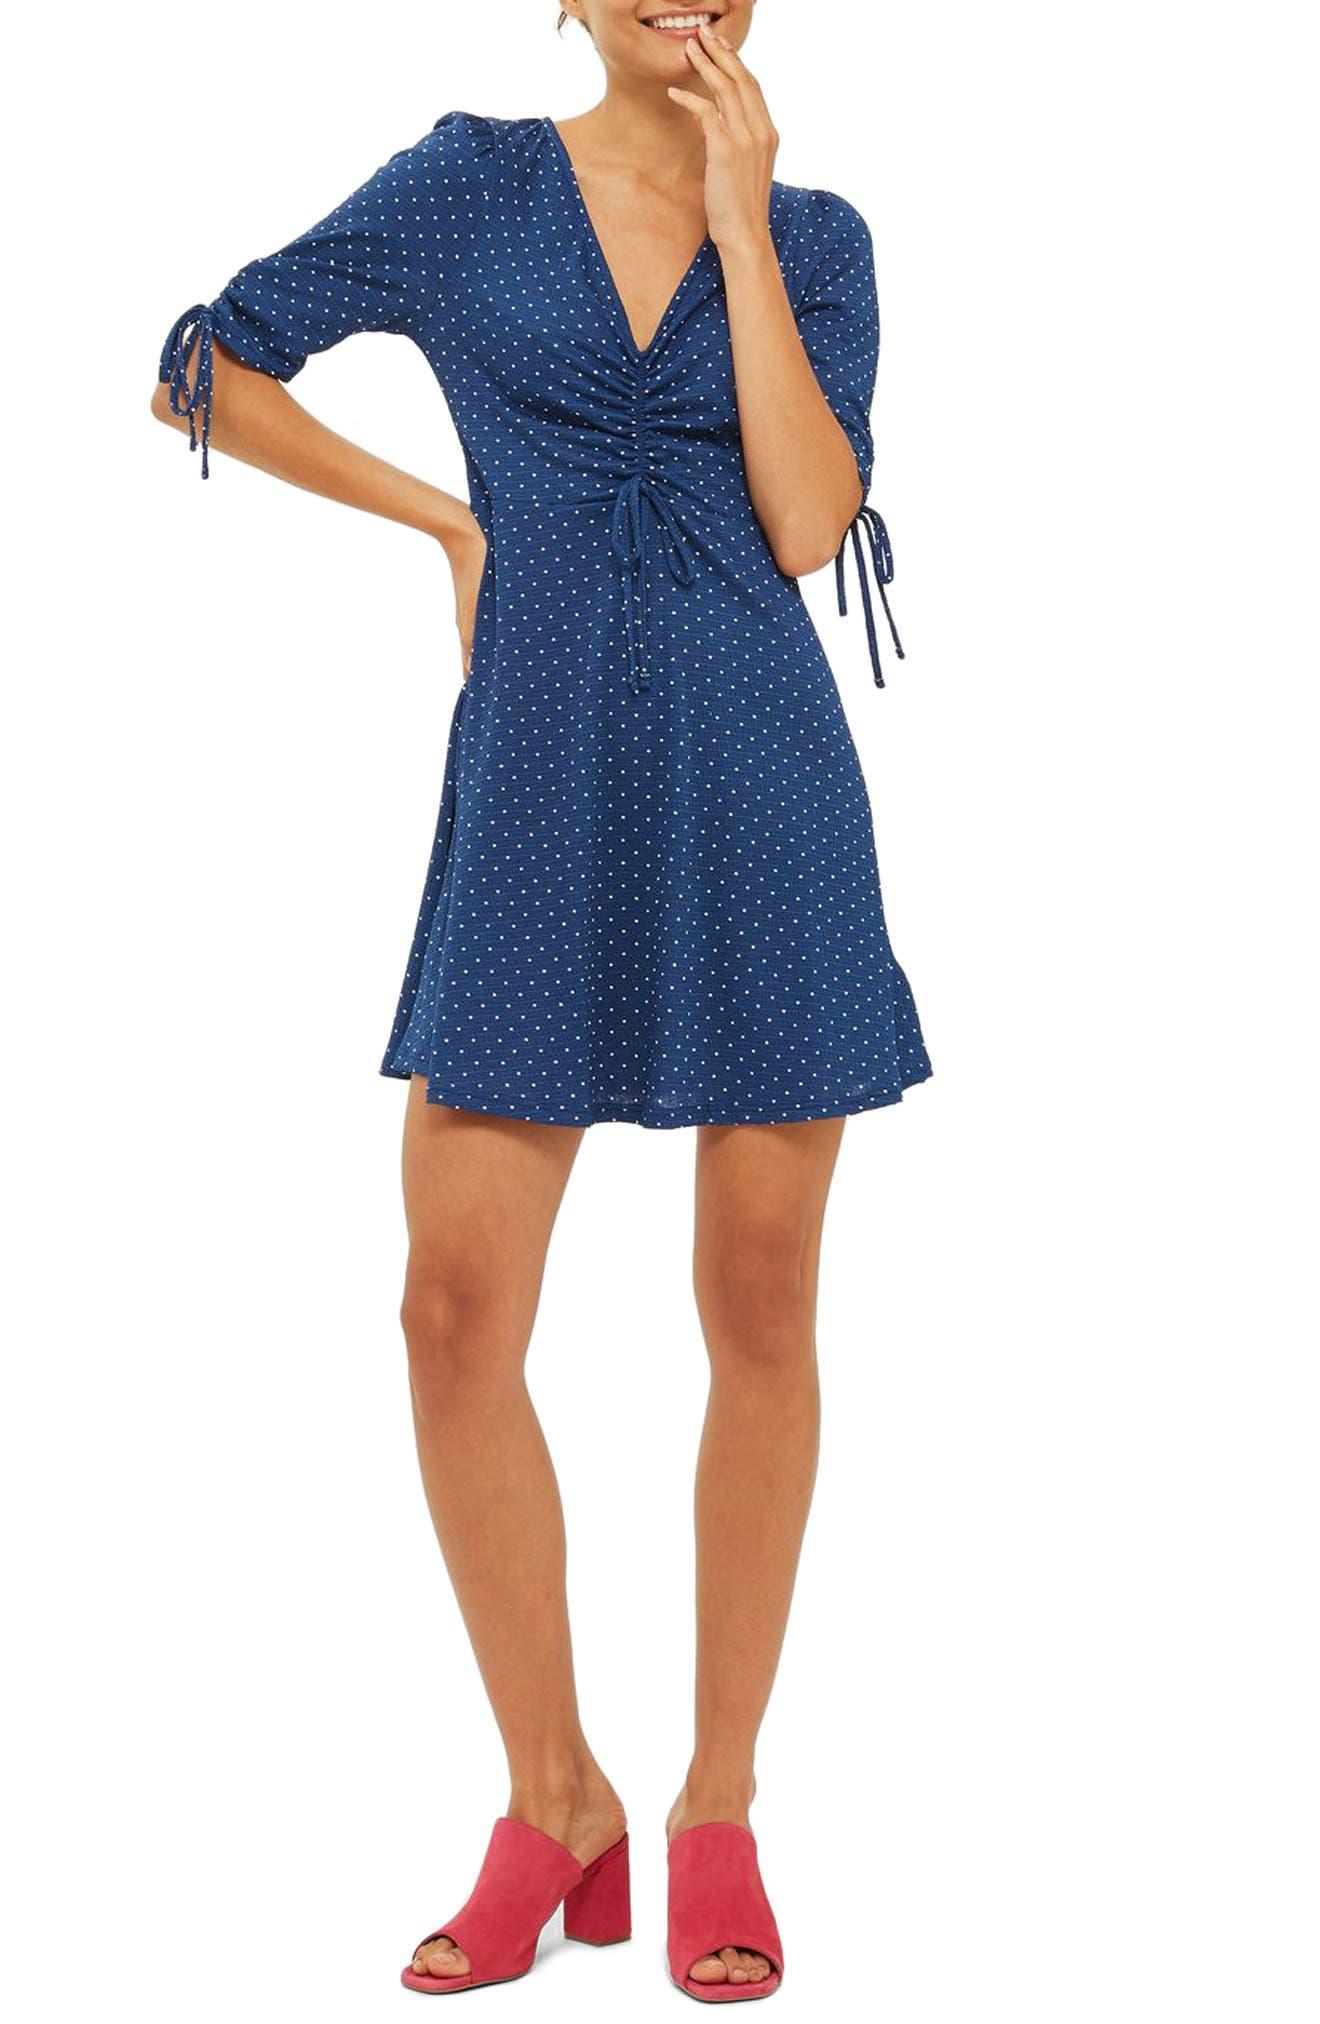 Topshop Polka Dot Tea Dress